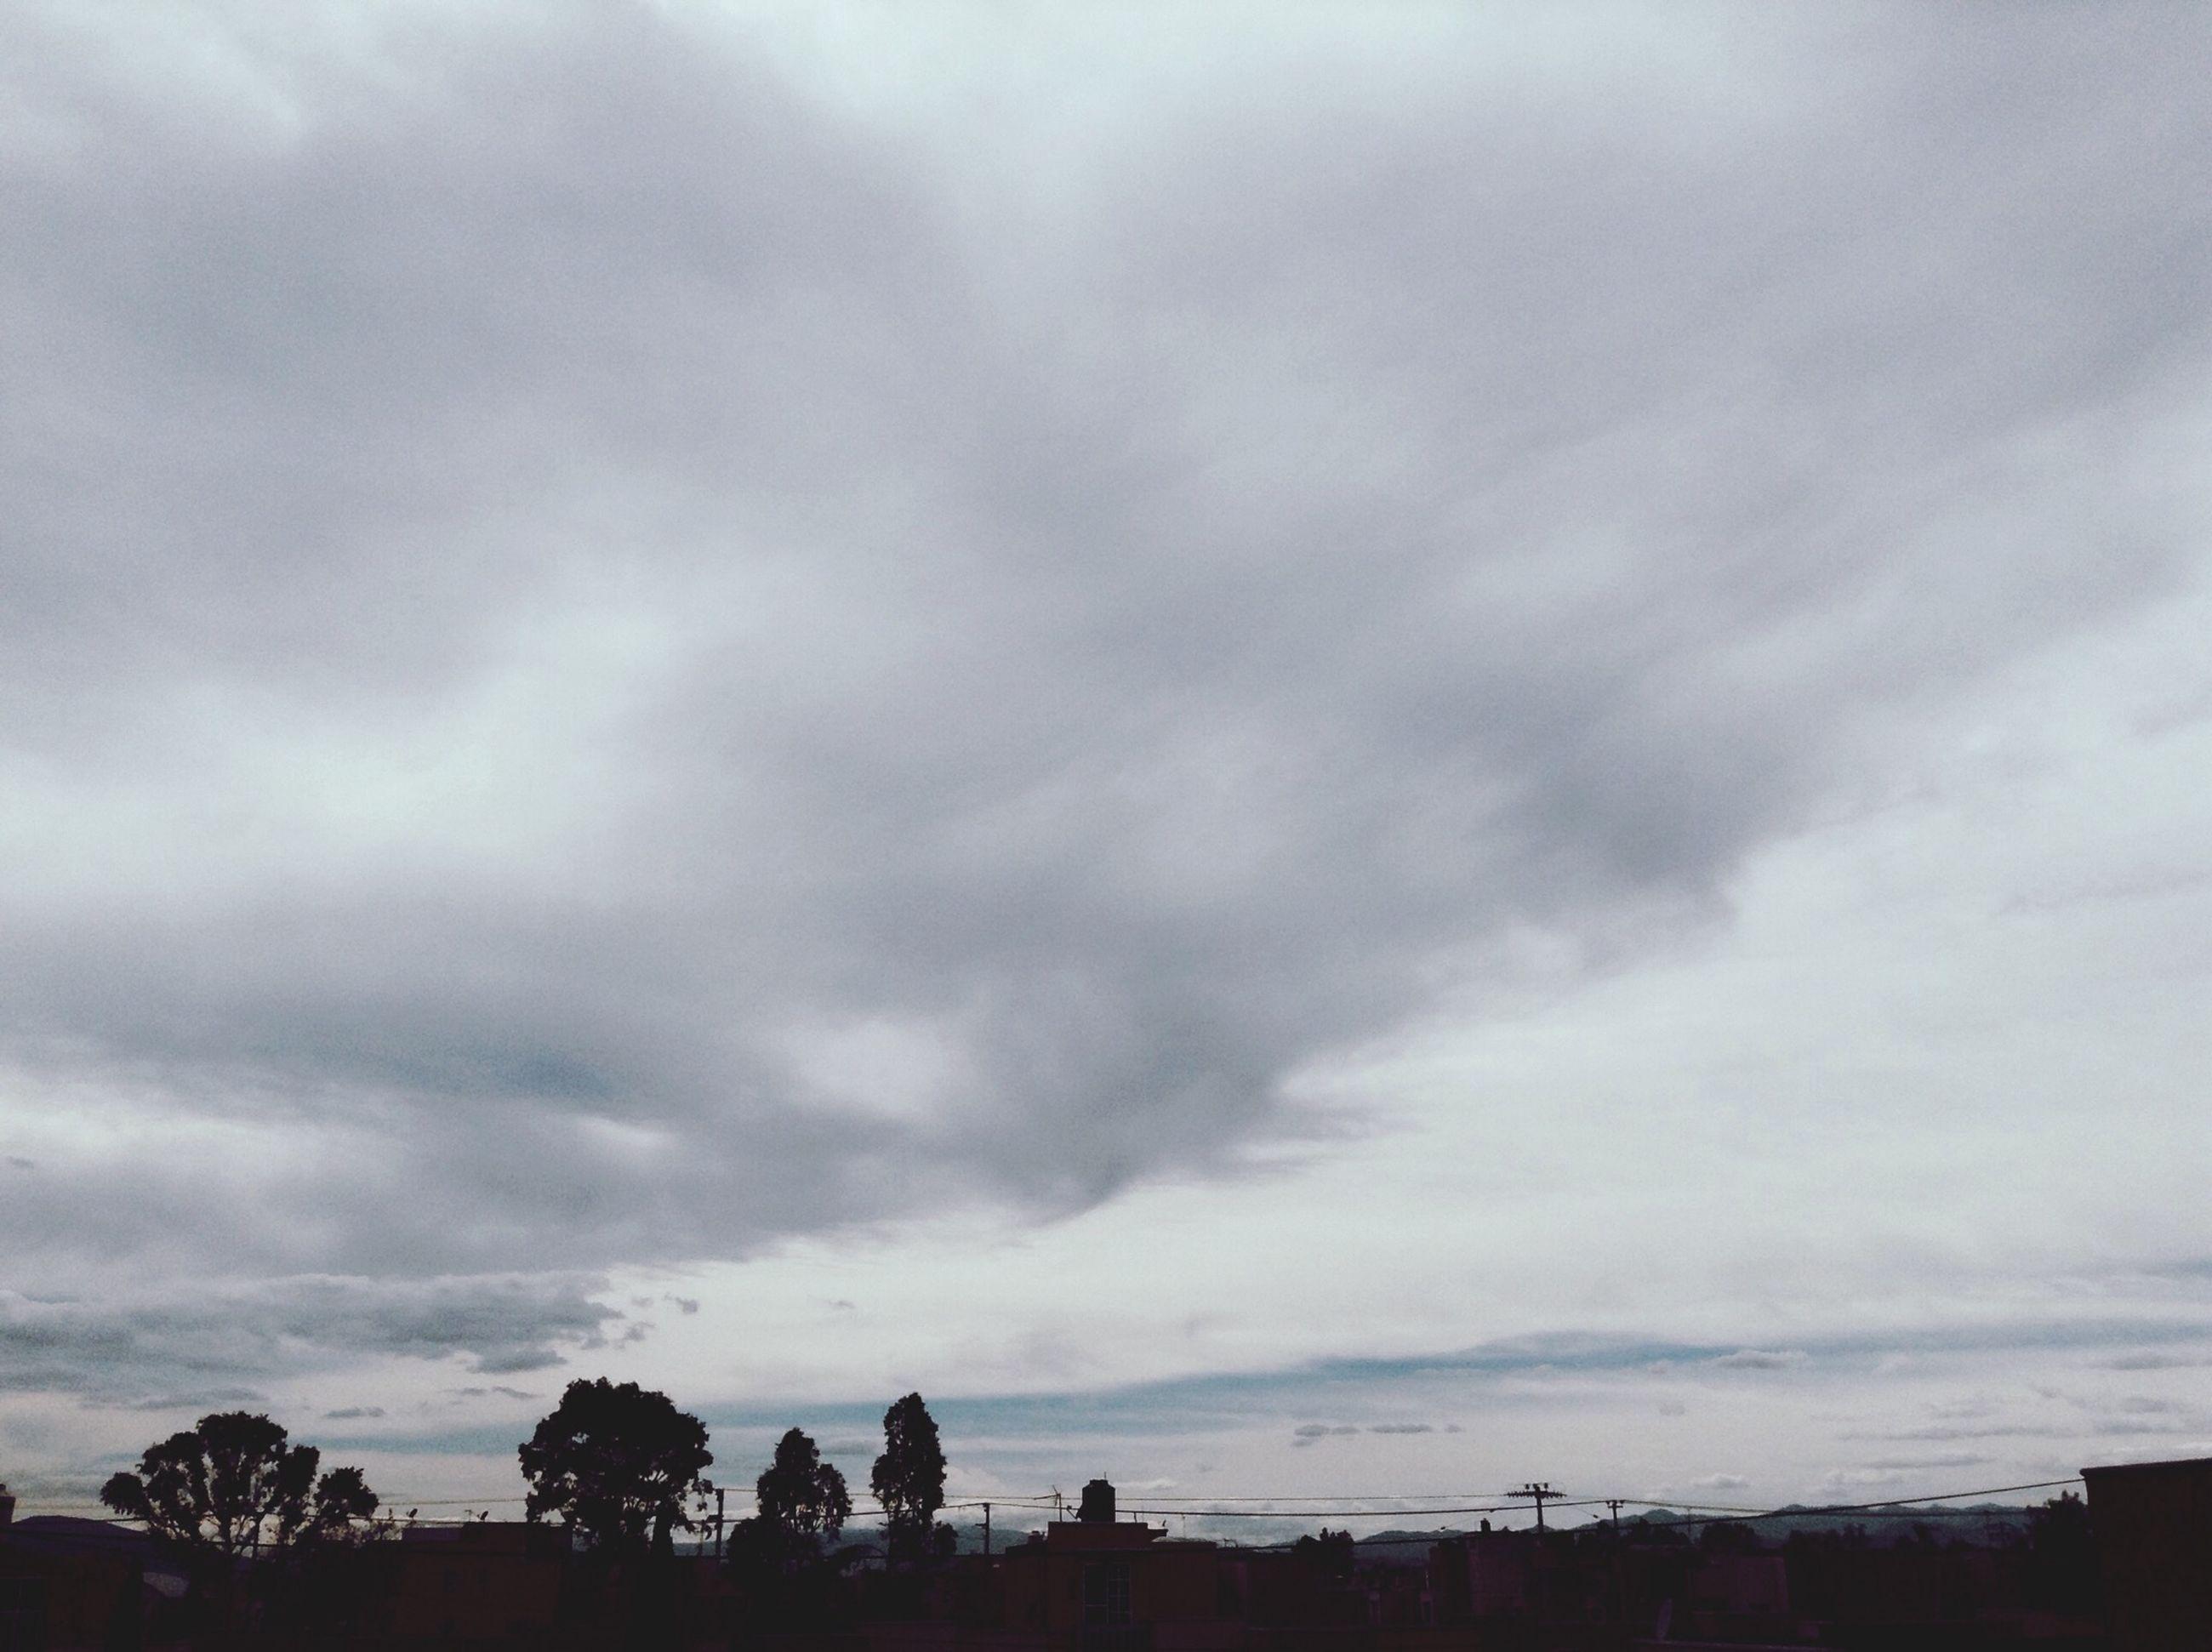 sky, cloud - sky, cloudy, tree, weather, silhouette, overcast, tranquility, beauty in nature, tranquil scene, scenics, nature, cloud, dusk, landscape, building exterior, built structure, cloudscape, storm cloud, outdoors